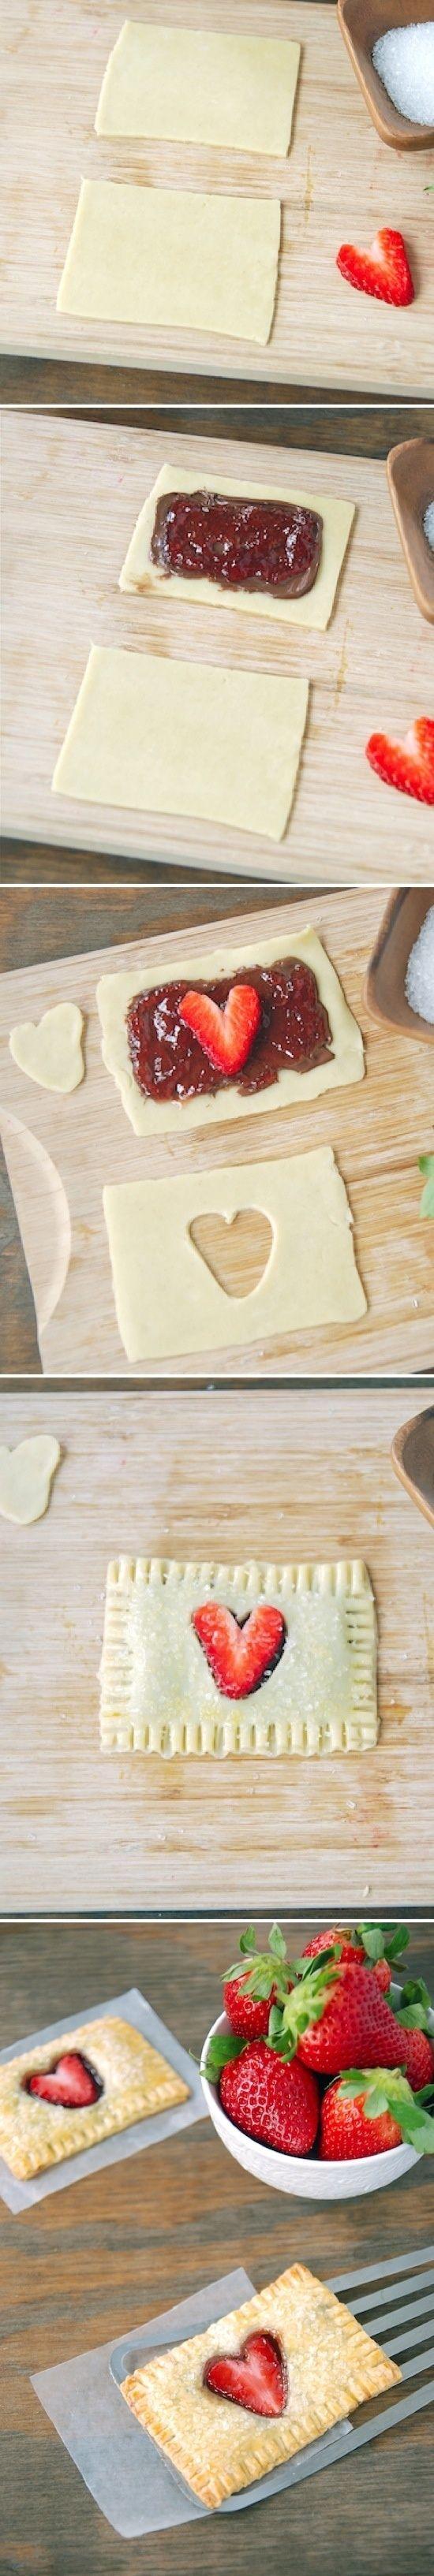 DIY Valentine Heart Poptart - Kids will love this!